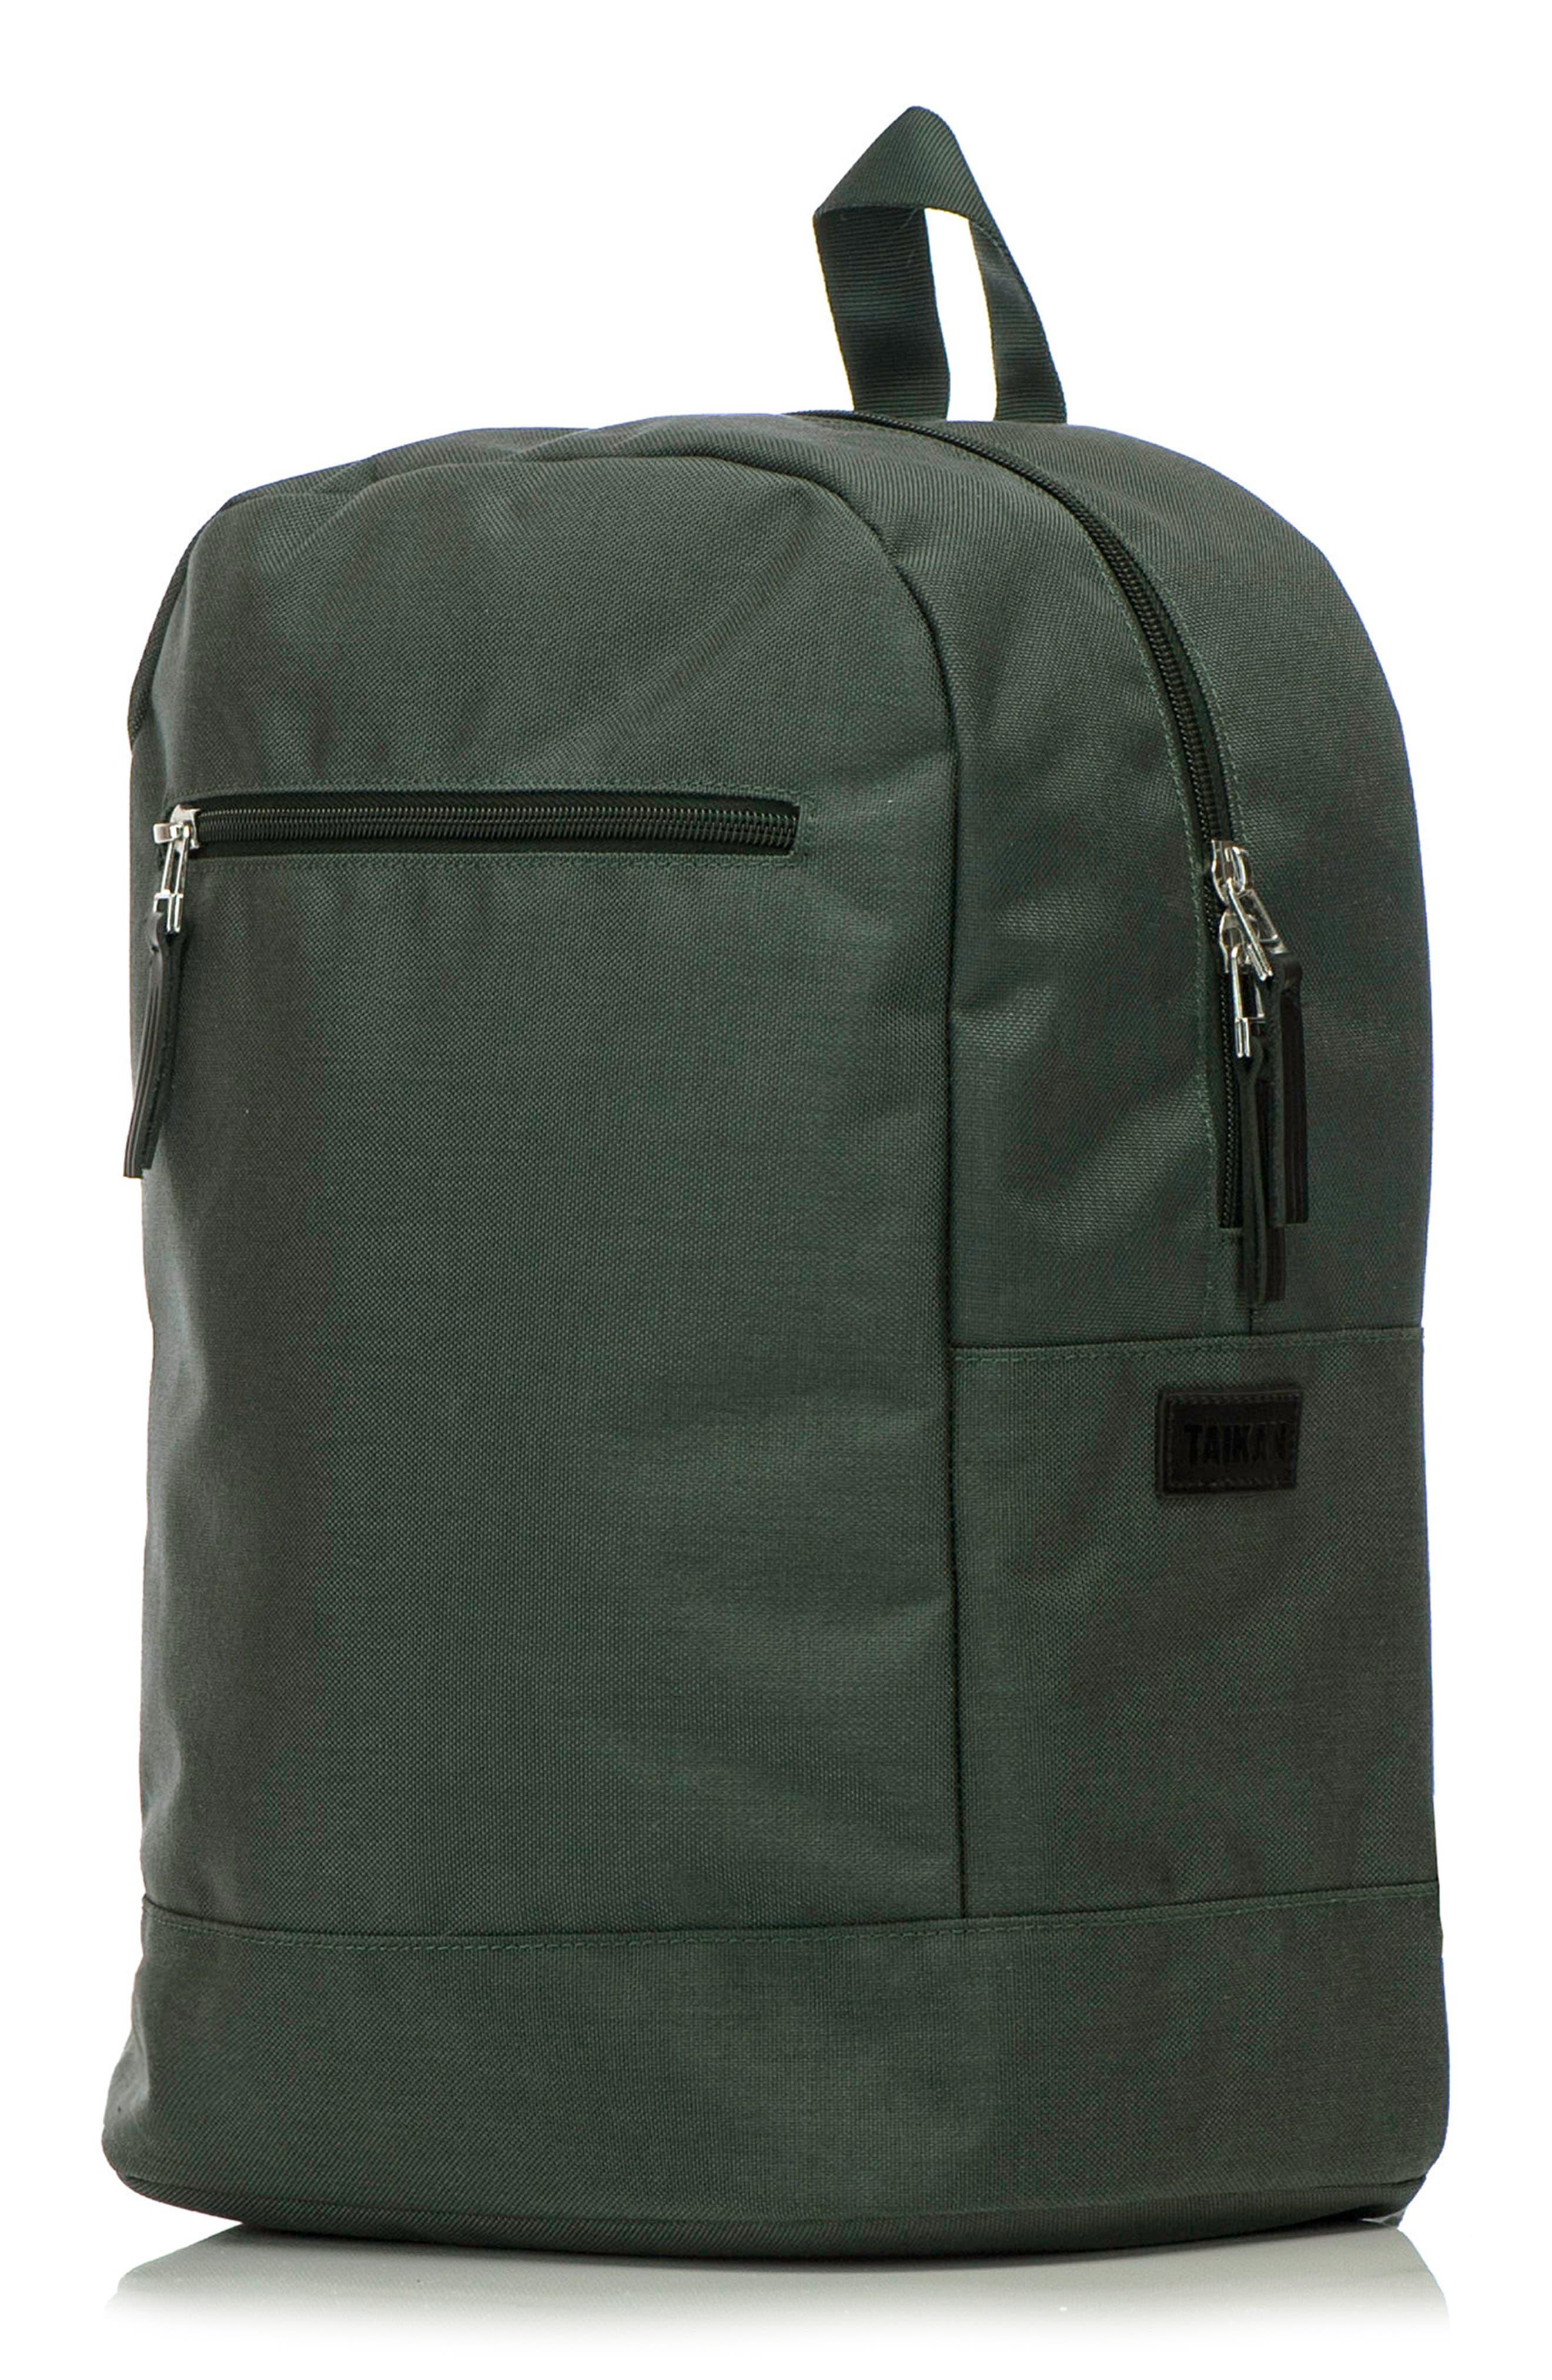 Tomcat Backpack,                             Alternate thumbnail 6, color,